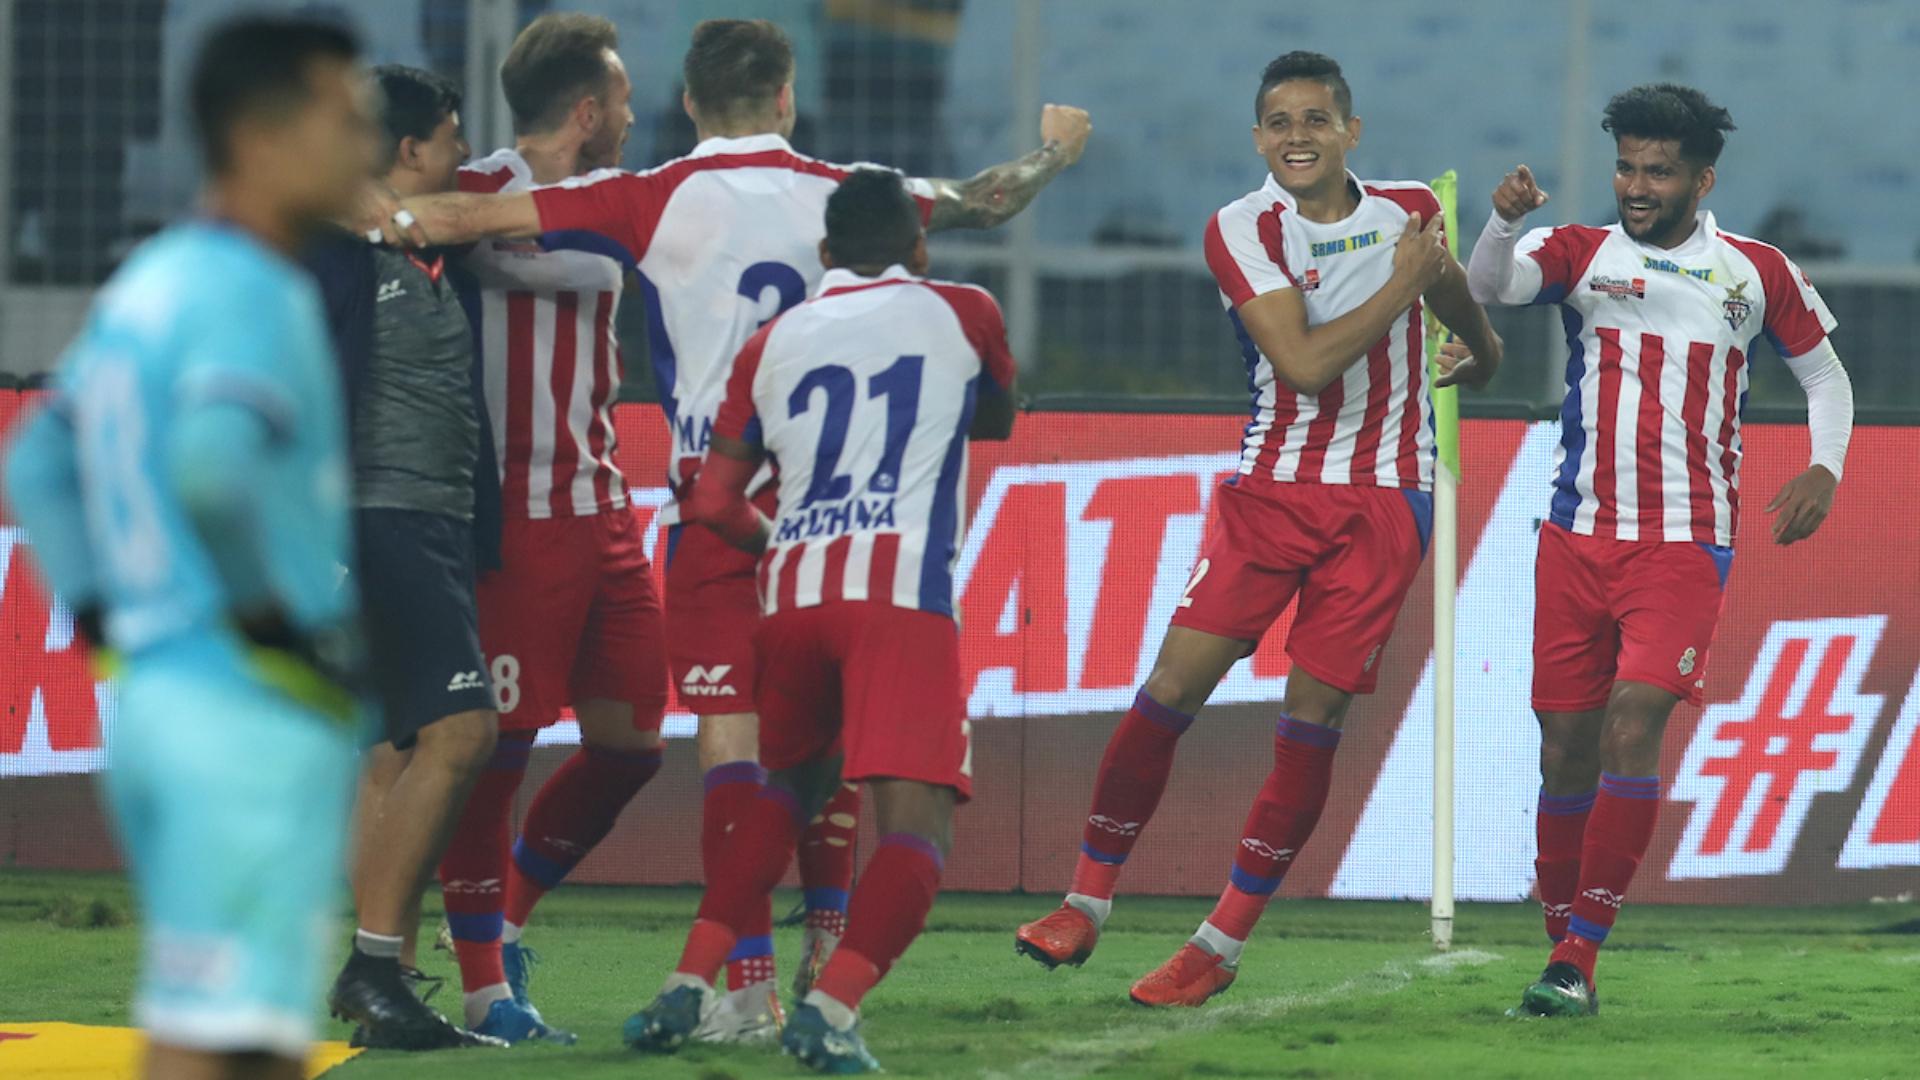 ATK v FC Goa